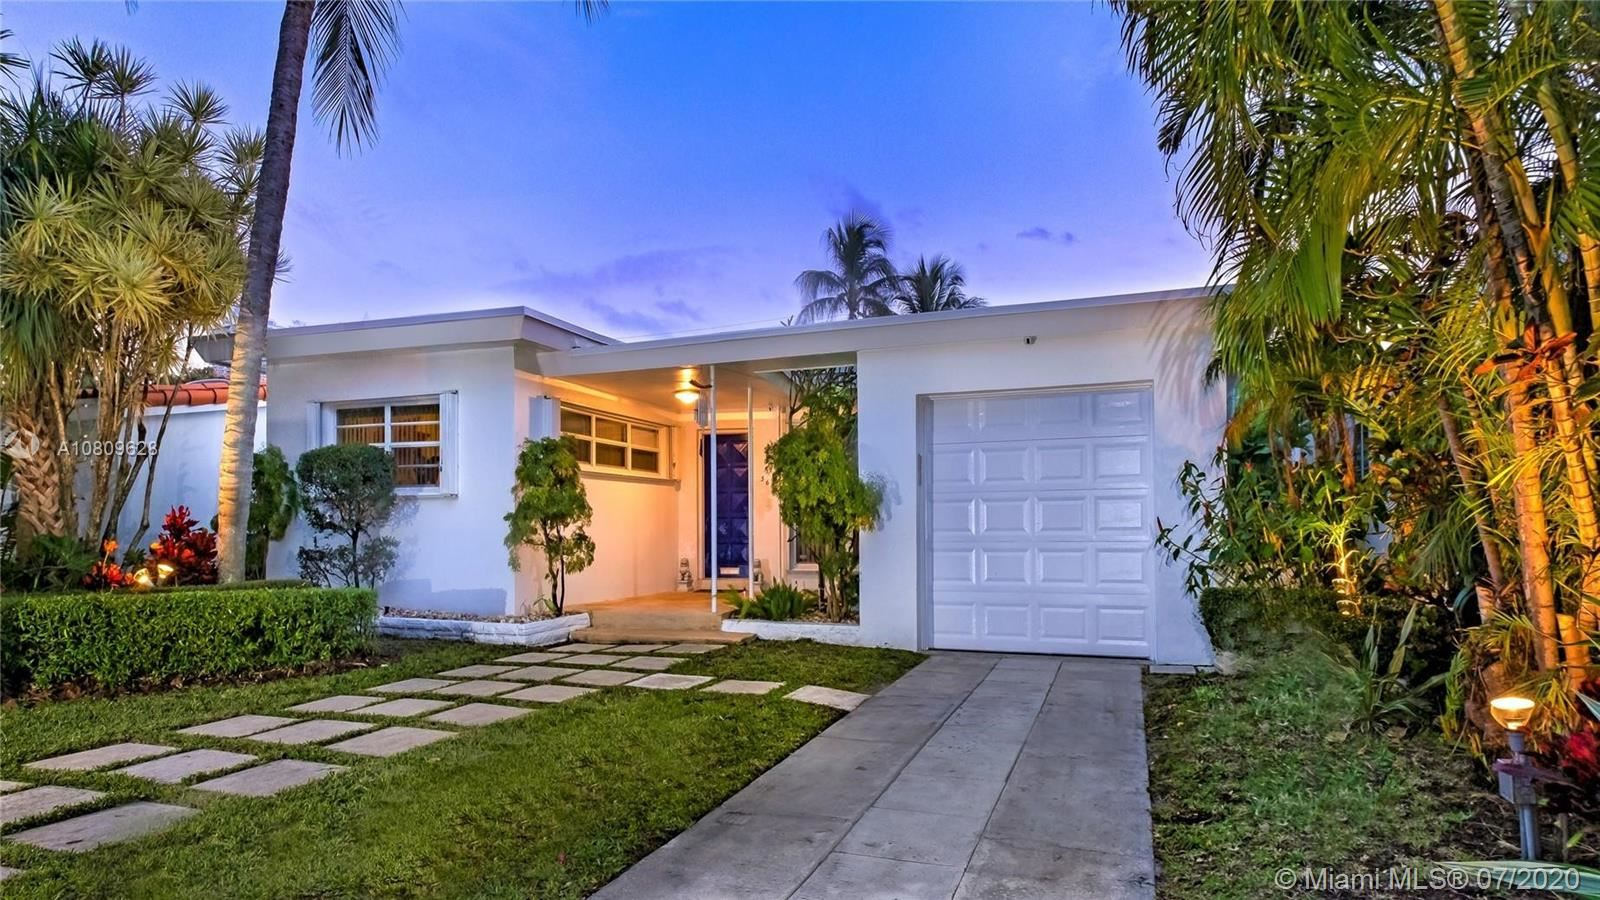 560 W 51st St, Miami Beach, FL 33140 - #: A10809628